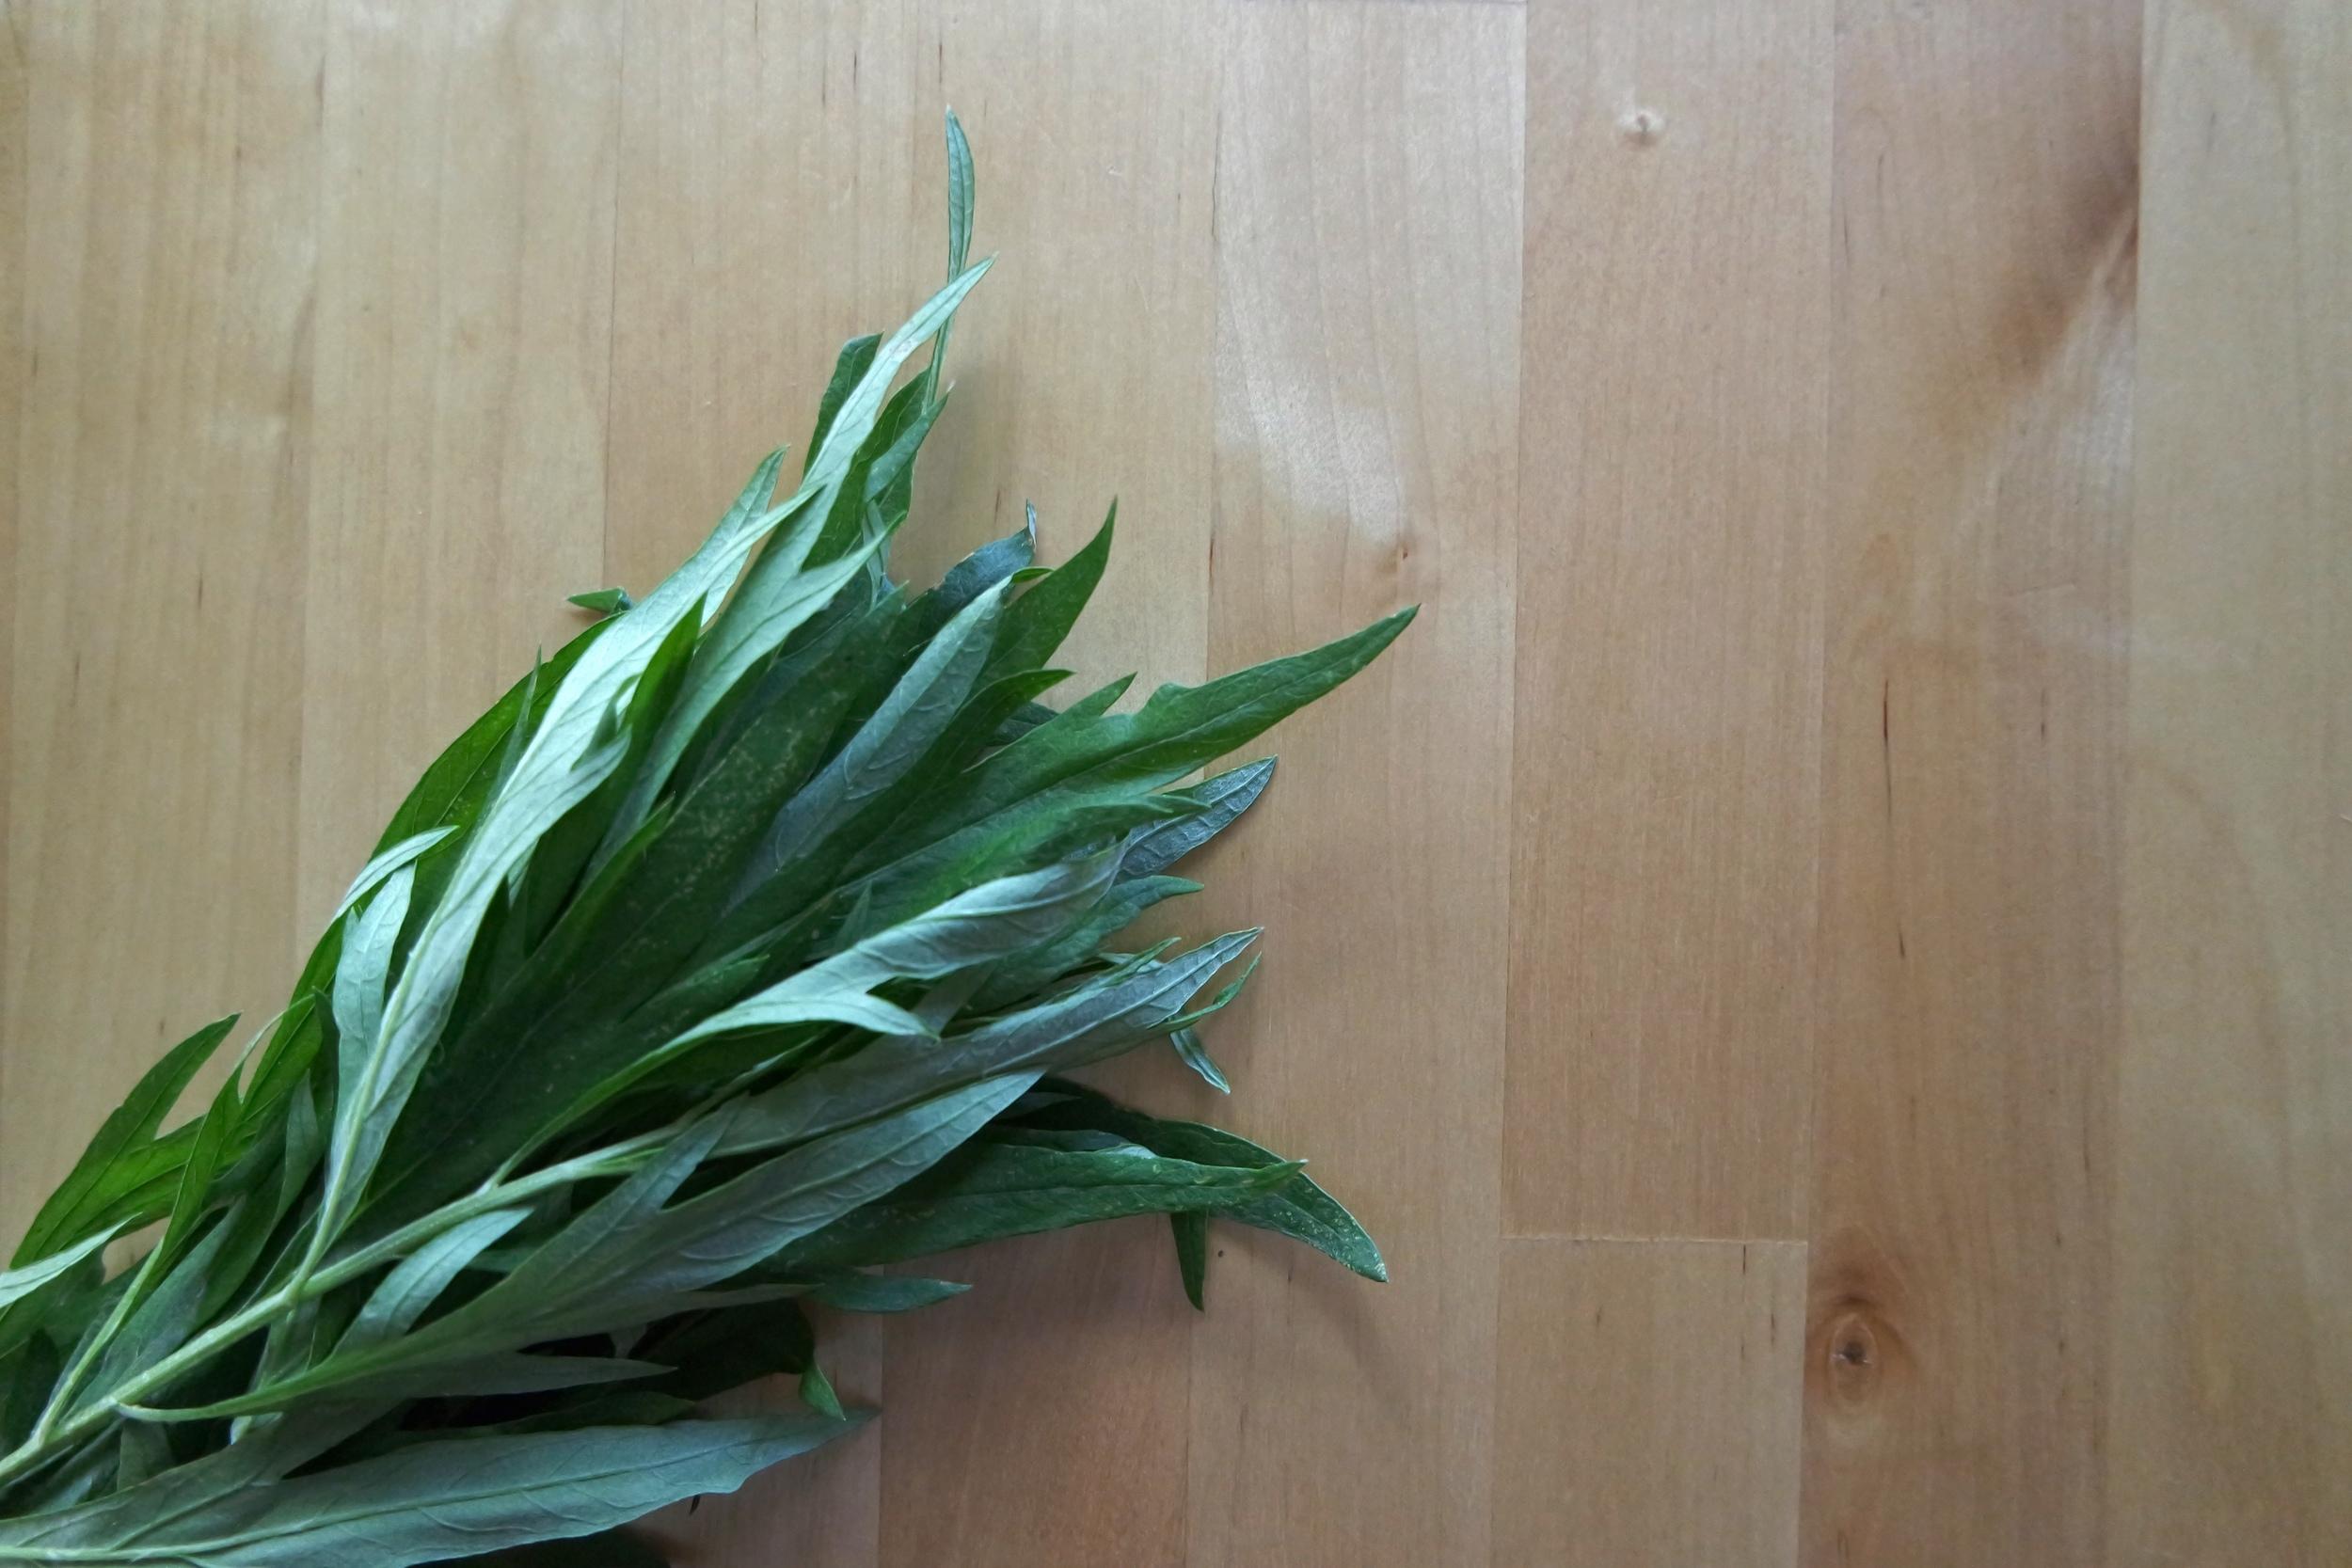 Artemisia douglasiana  aka Dream Plant by author